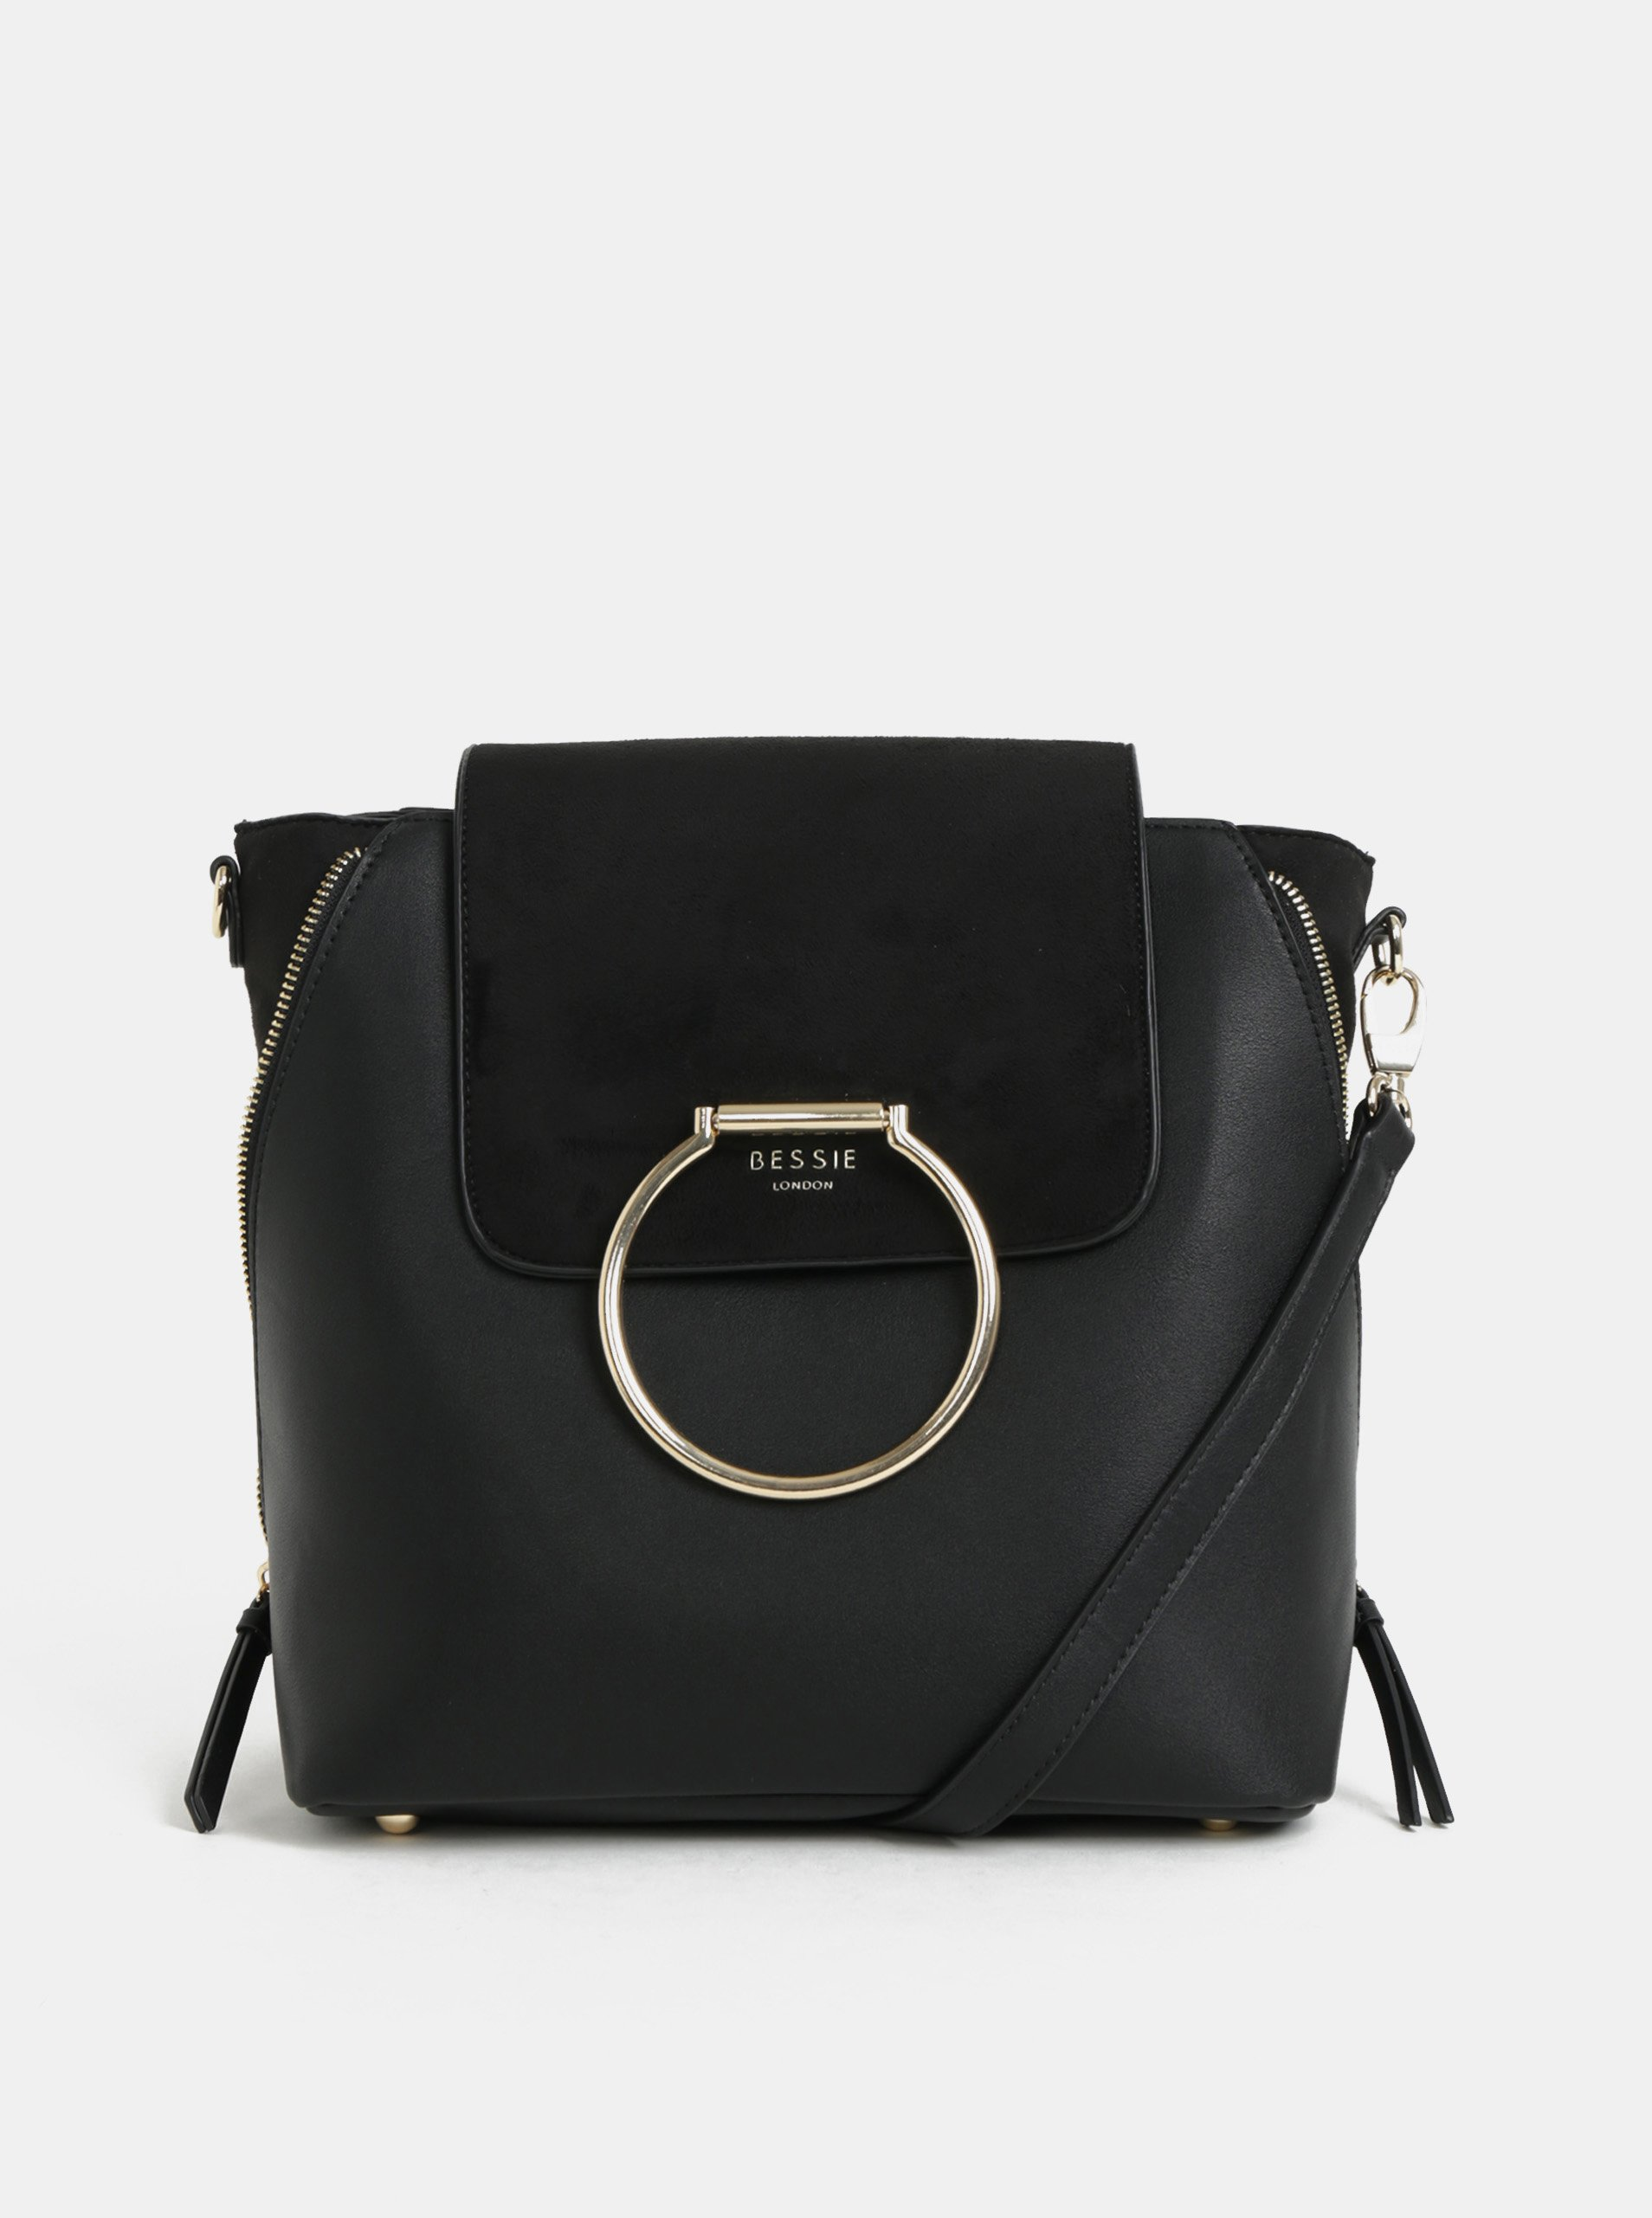 74a0bede87 Černá kabelka batoh Bessie London